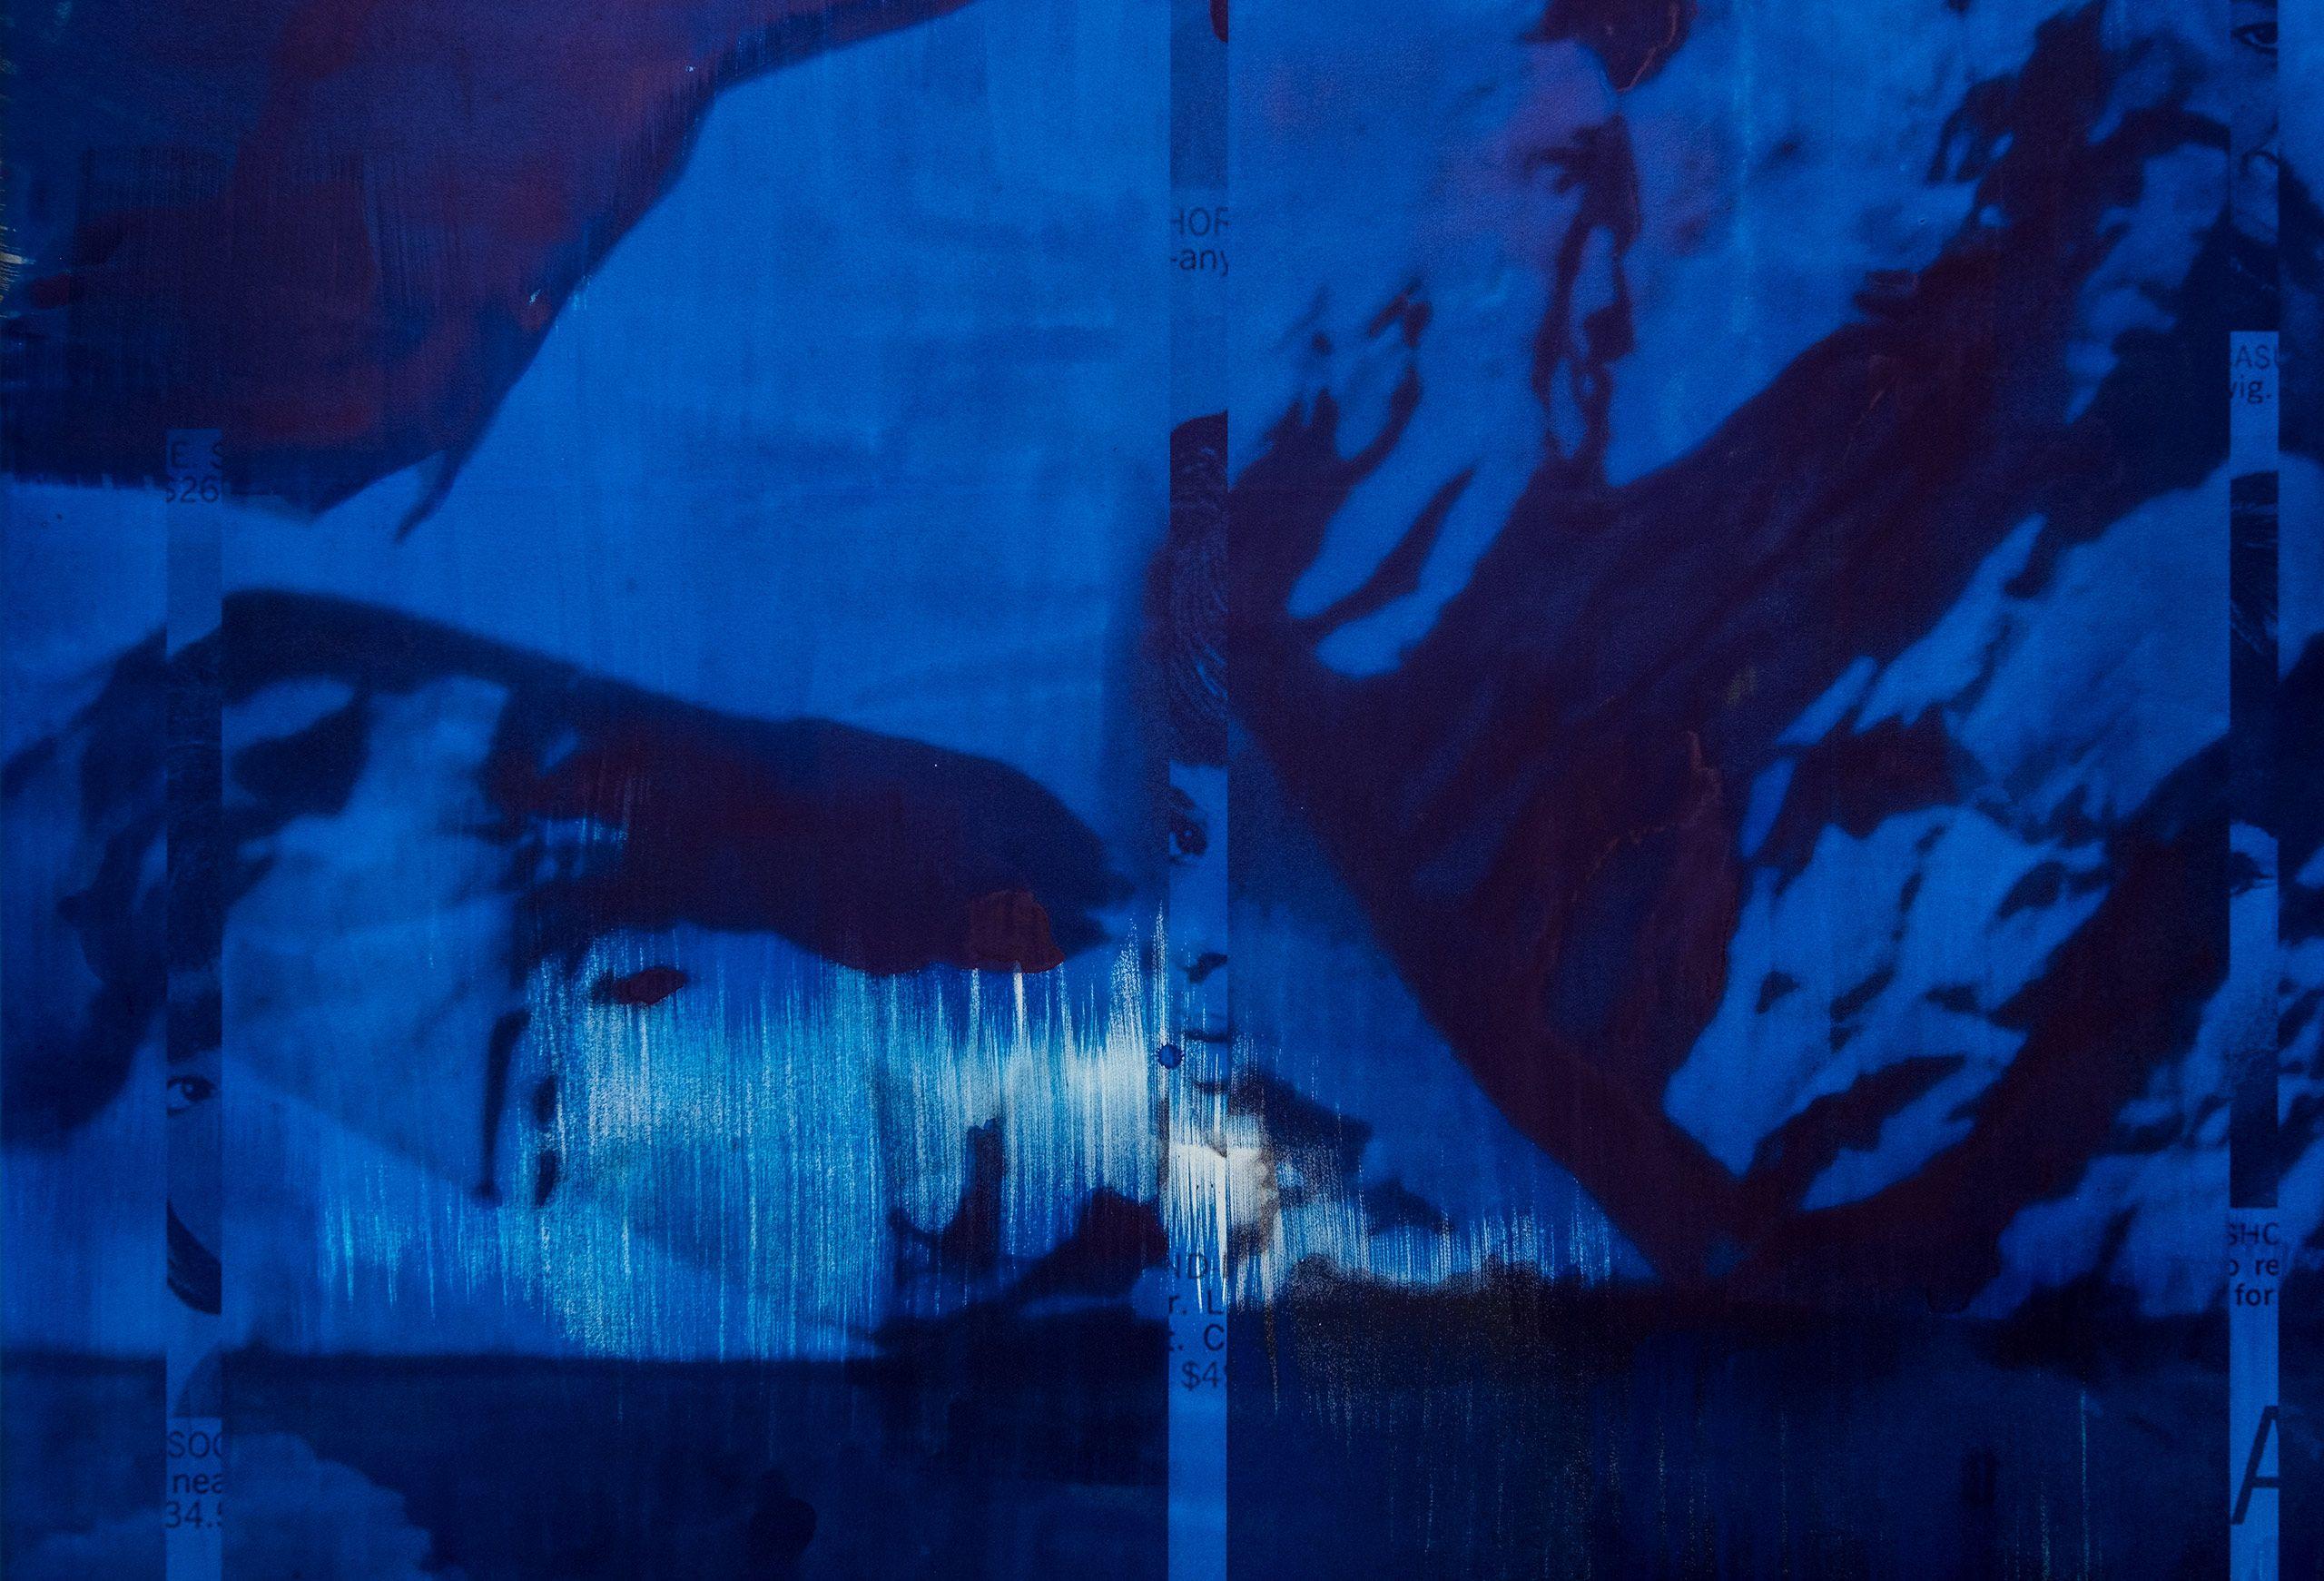 Blue Turned Temporal, 2019 (detail)